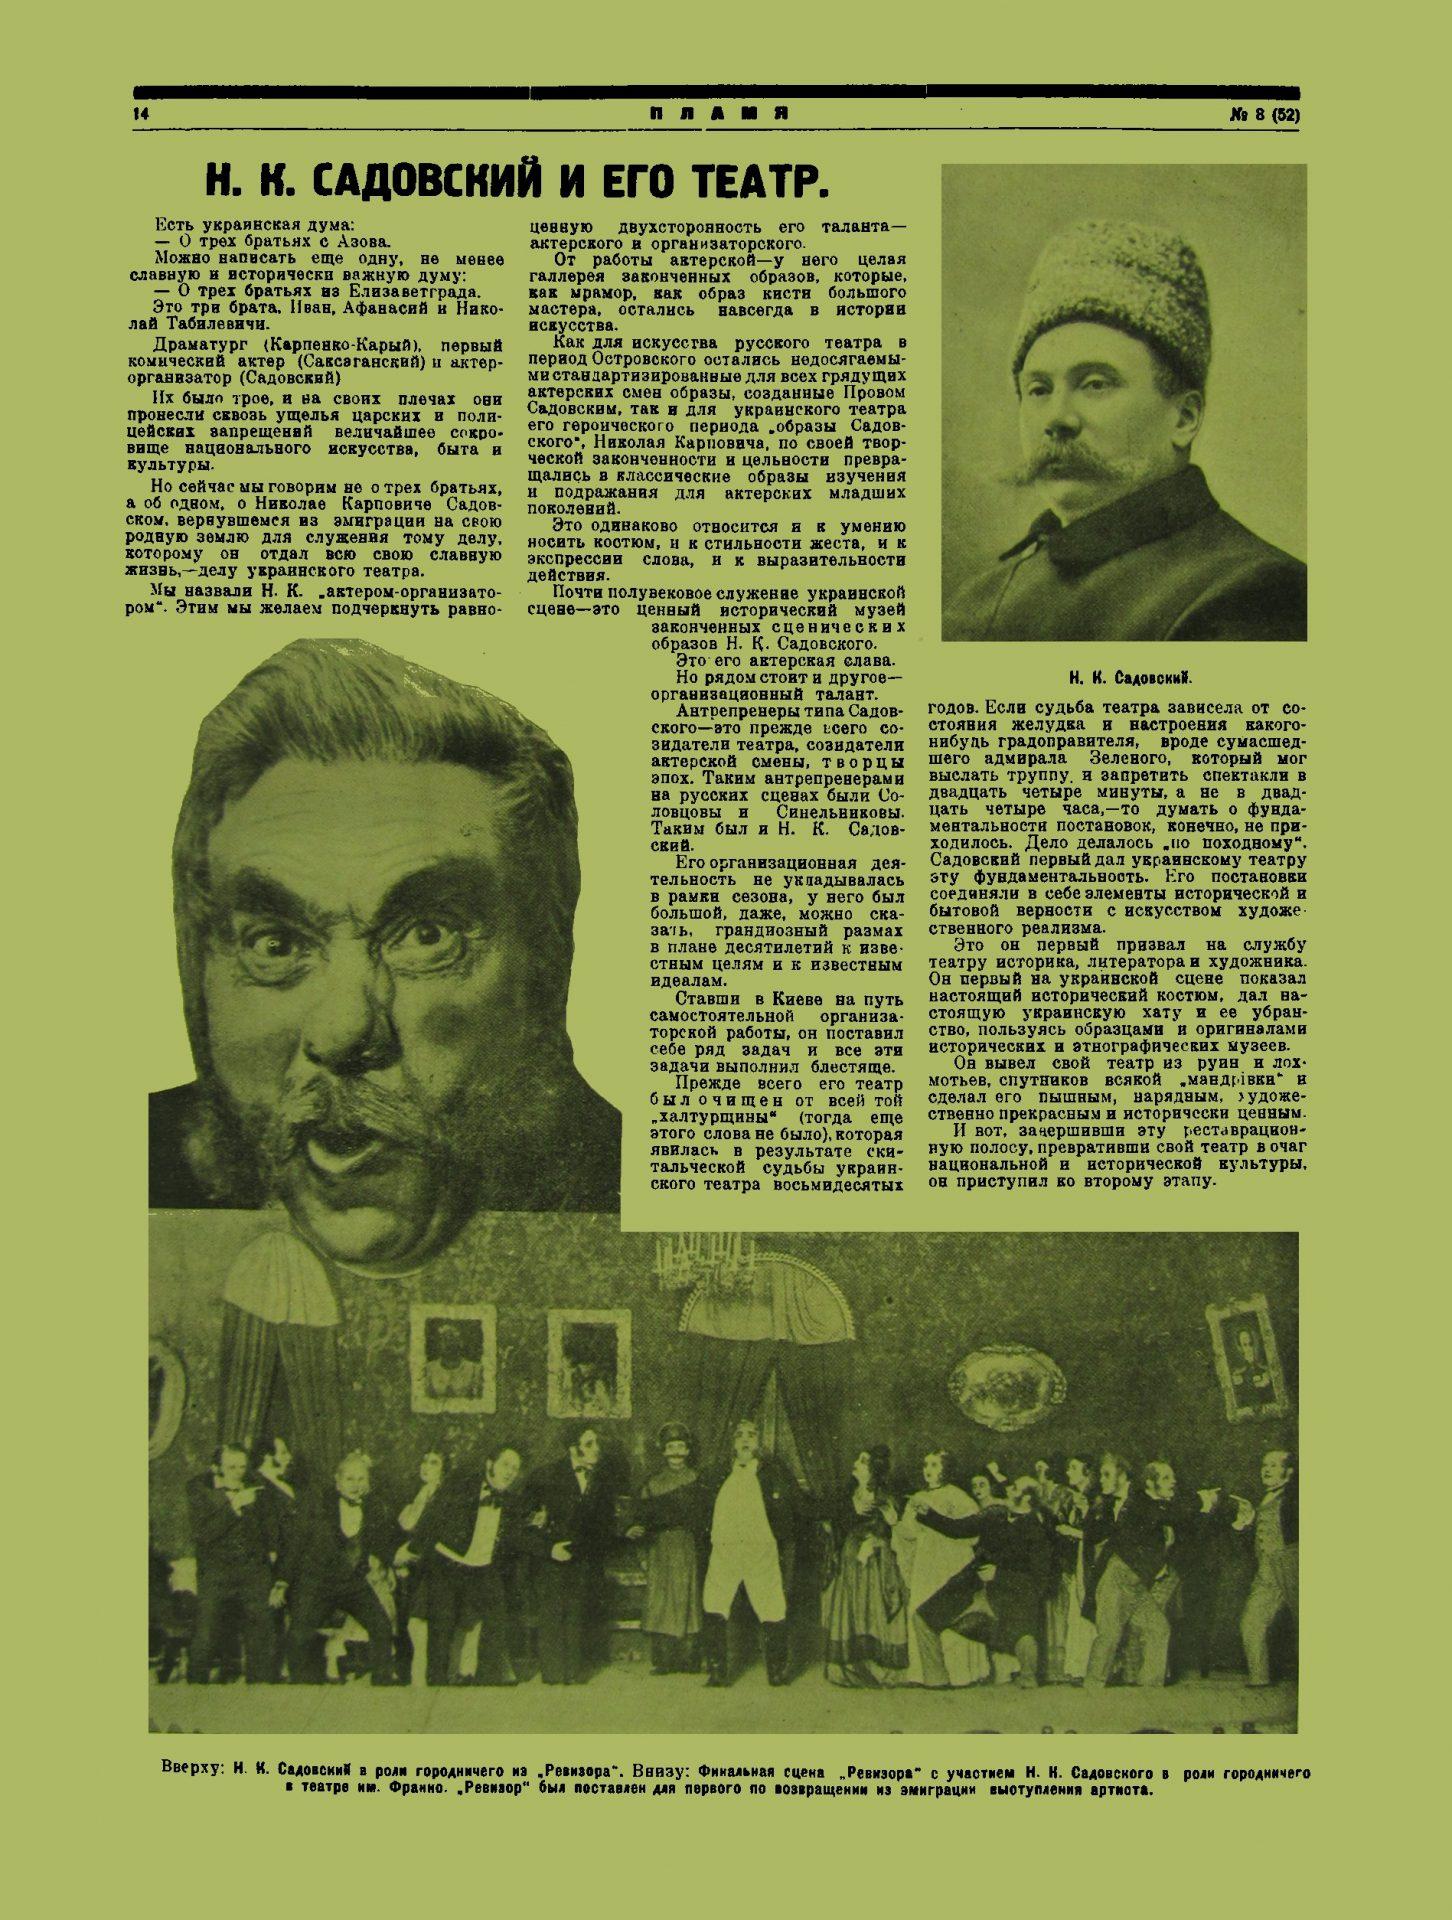 Пламя_1926_№ 8